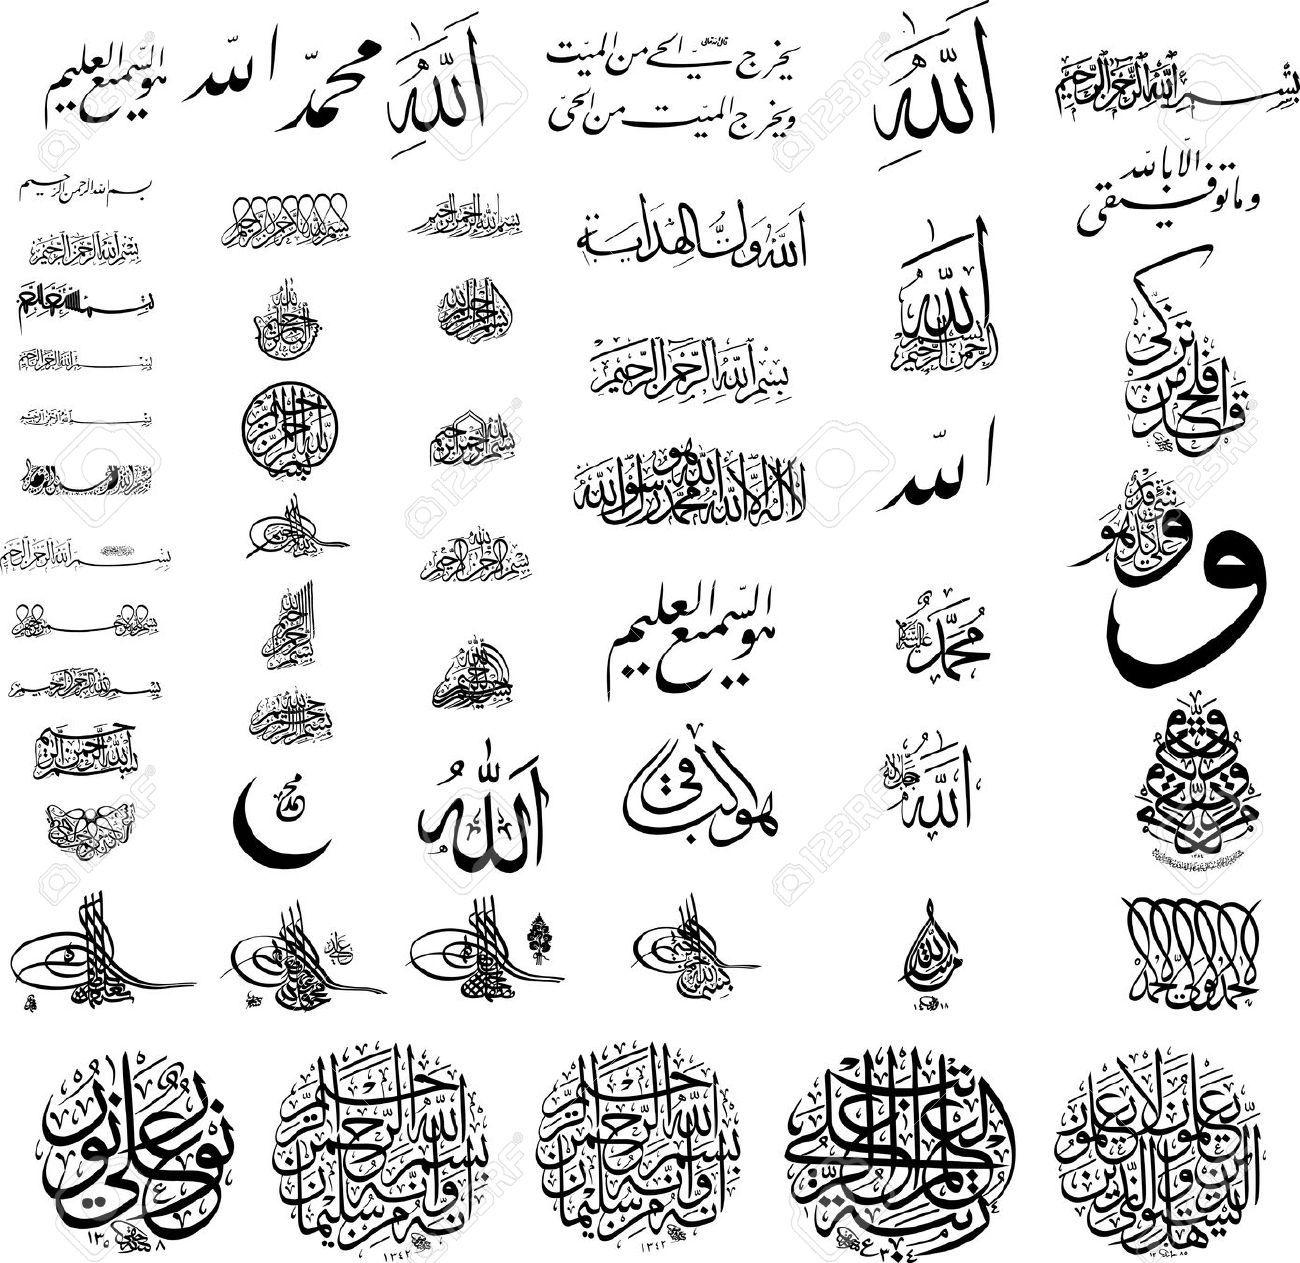 4559541 arabic symbols vector set of arabic writing ottoman sultan 4559541 arabic symbols vector set of arabic writing biocorpaavc